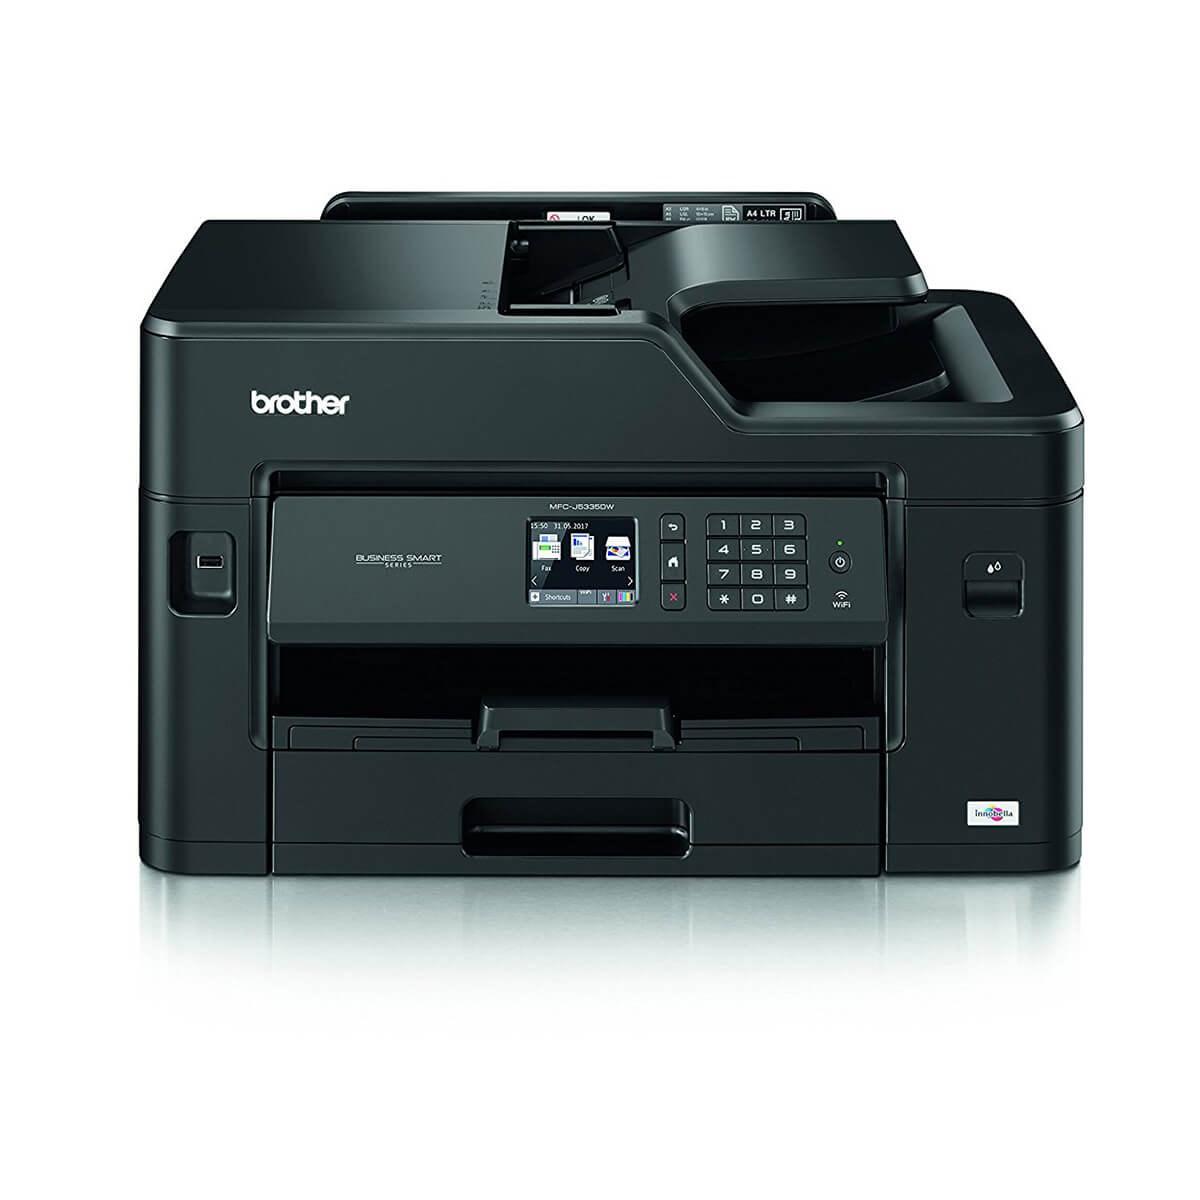 Brother MFC-J5335DW Colour Inkjet Printer £109.99 with promo + £50 cashback (£59.99) @ Office Outlet